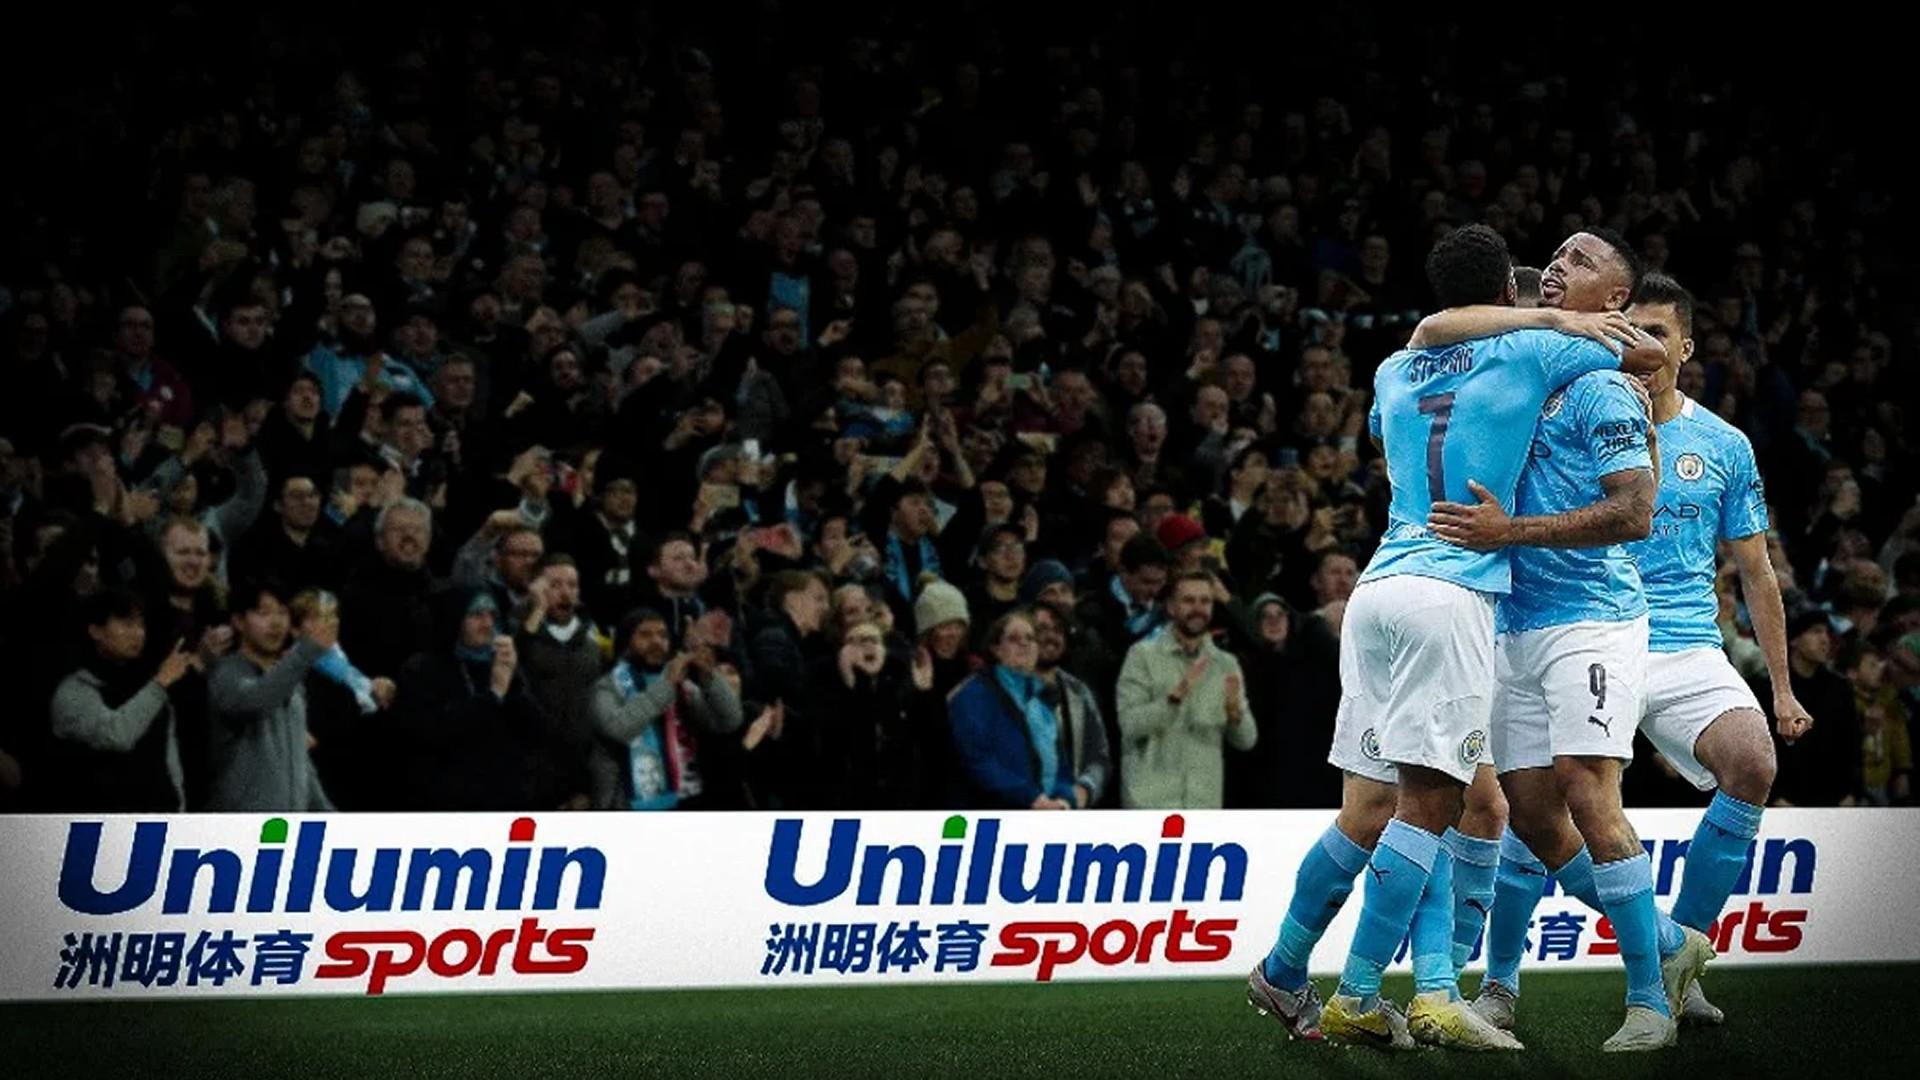 Manchester City – Unilumin